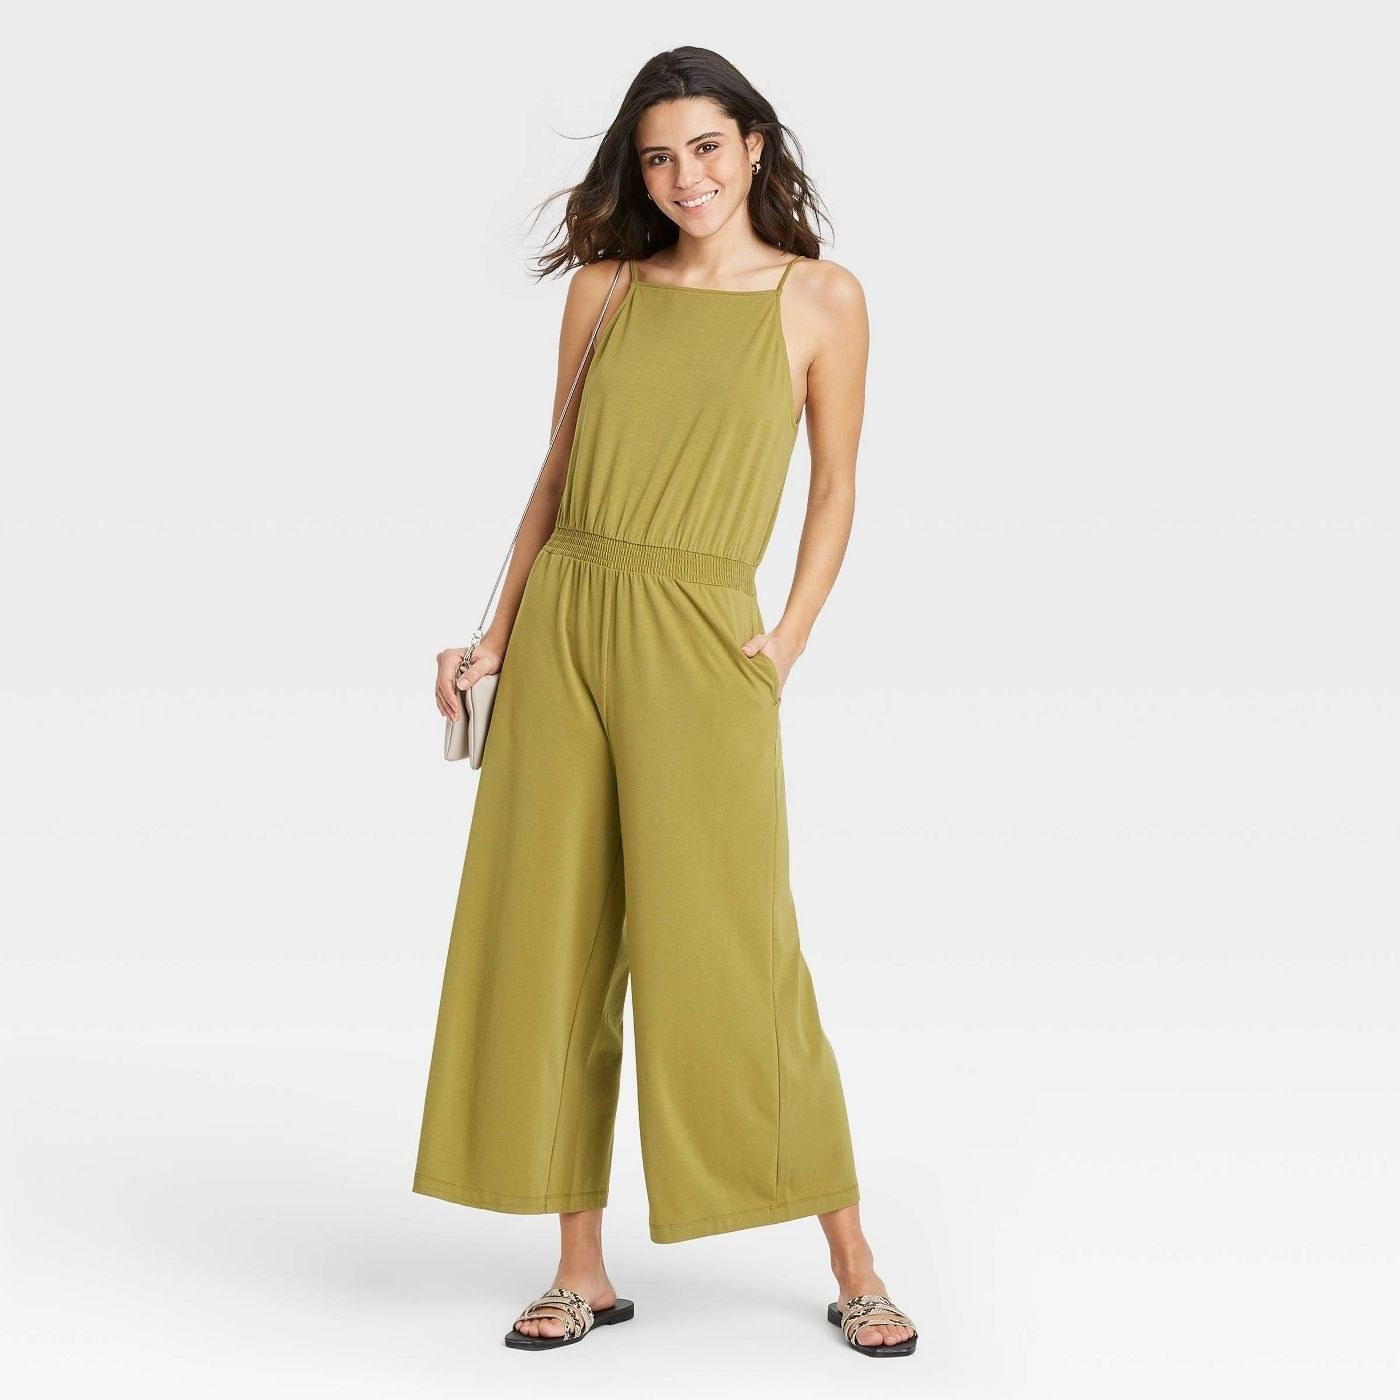 Model in sleeveless smocked jumpsuit